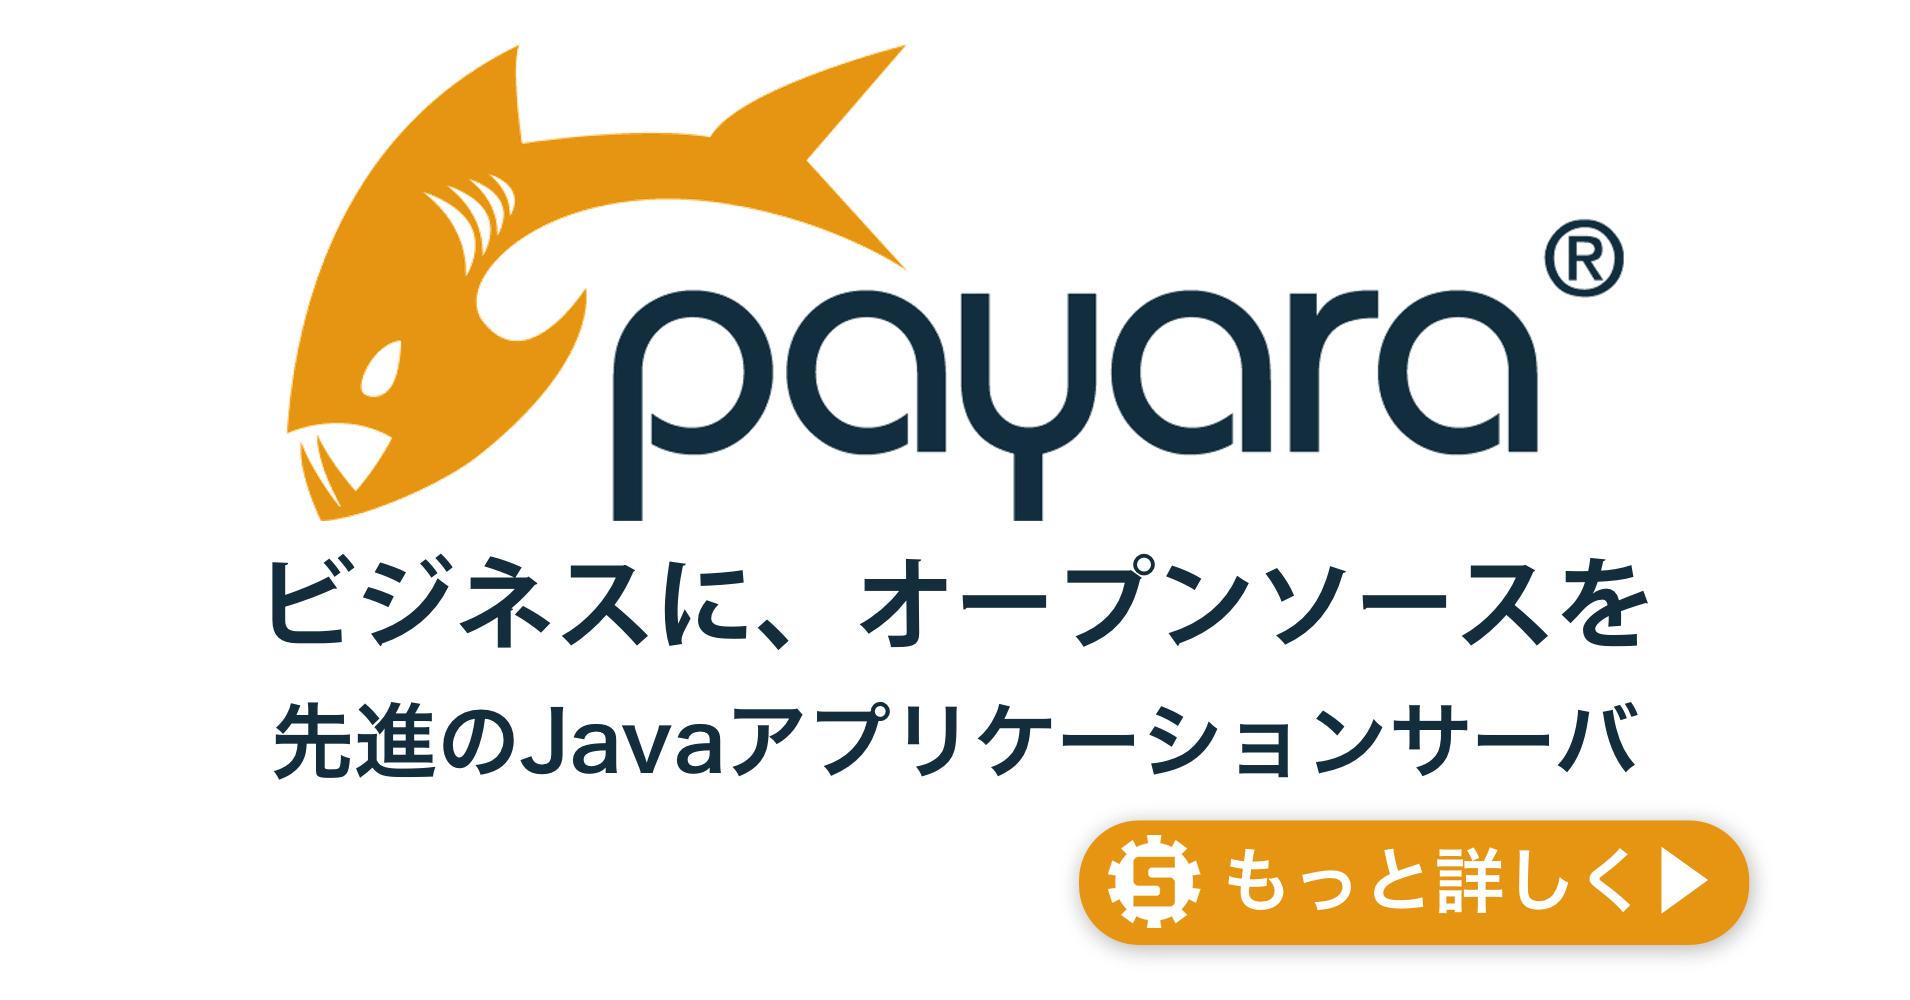 Payara Services Ltd社とパートナー契約を締結いたしました